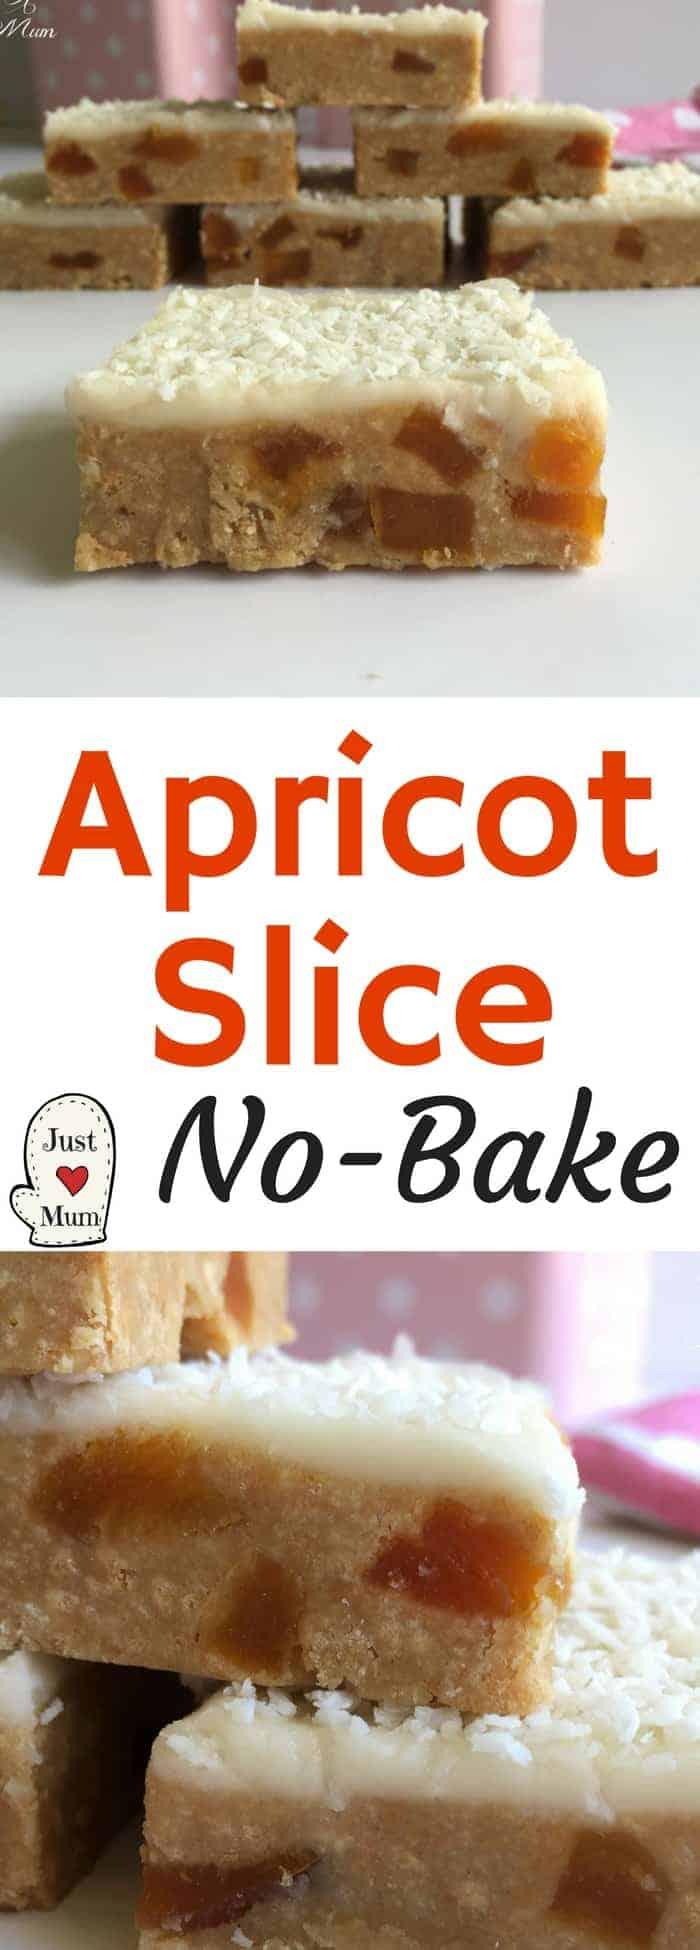 Just A Mum's Apricot Slice - No Bake